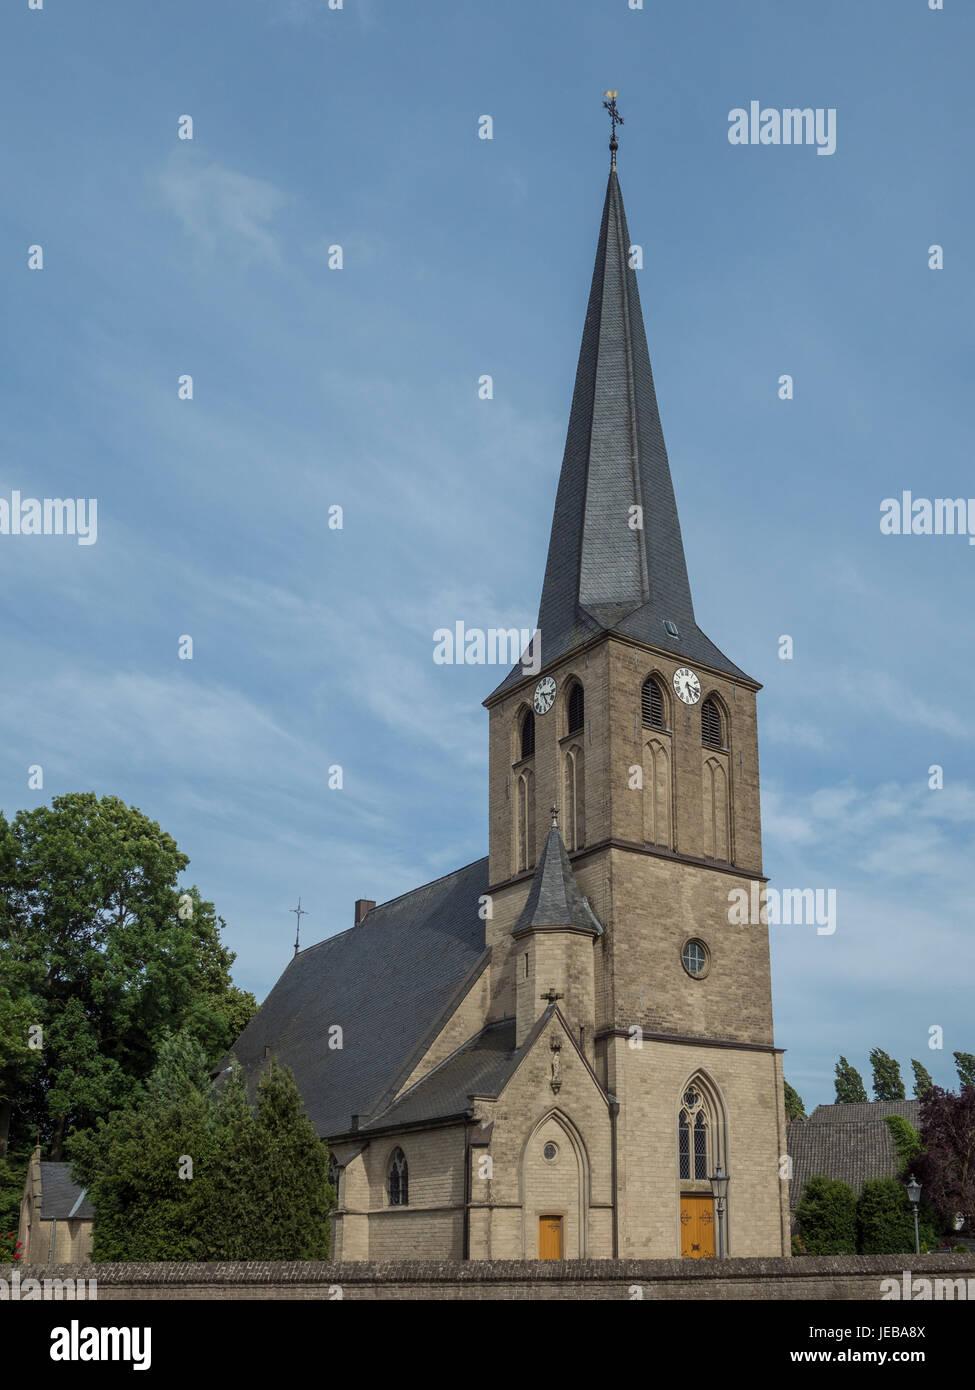 St. Regenfledis church in Kalkar, Hoennepel, Germany - Stock Image